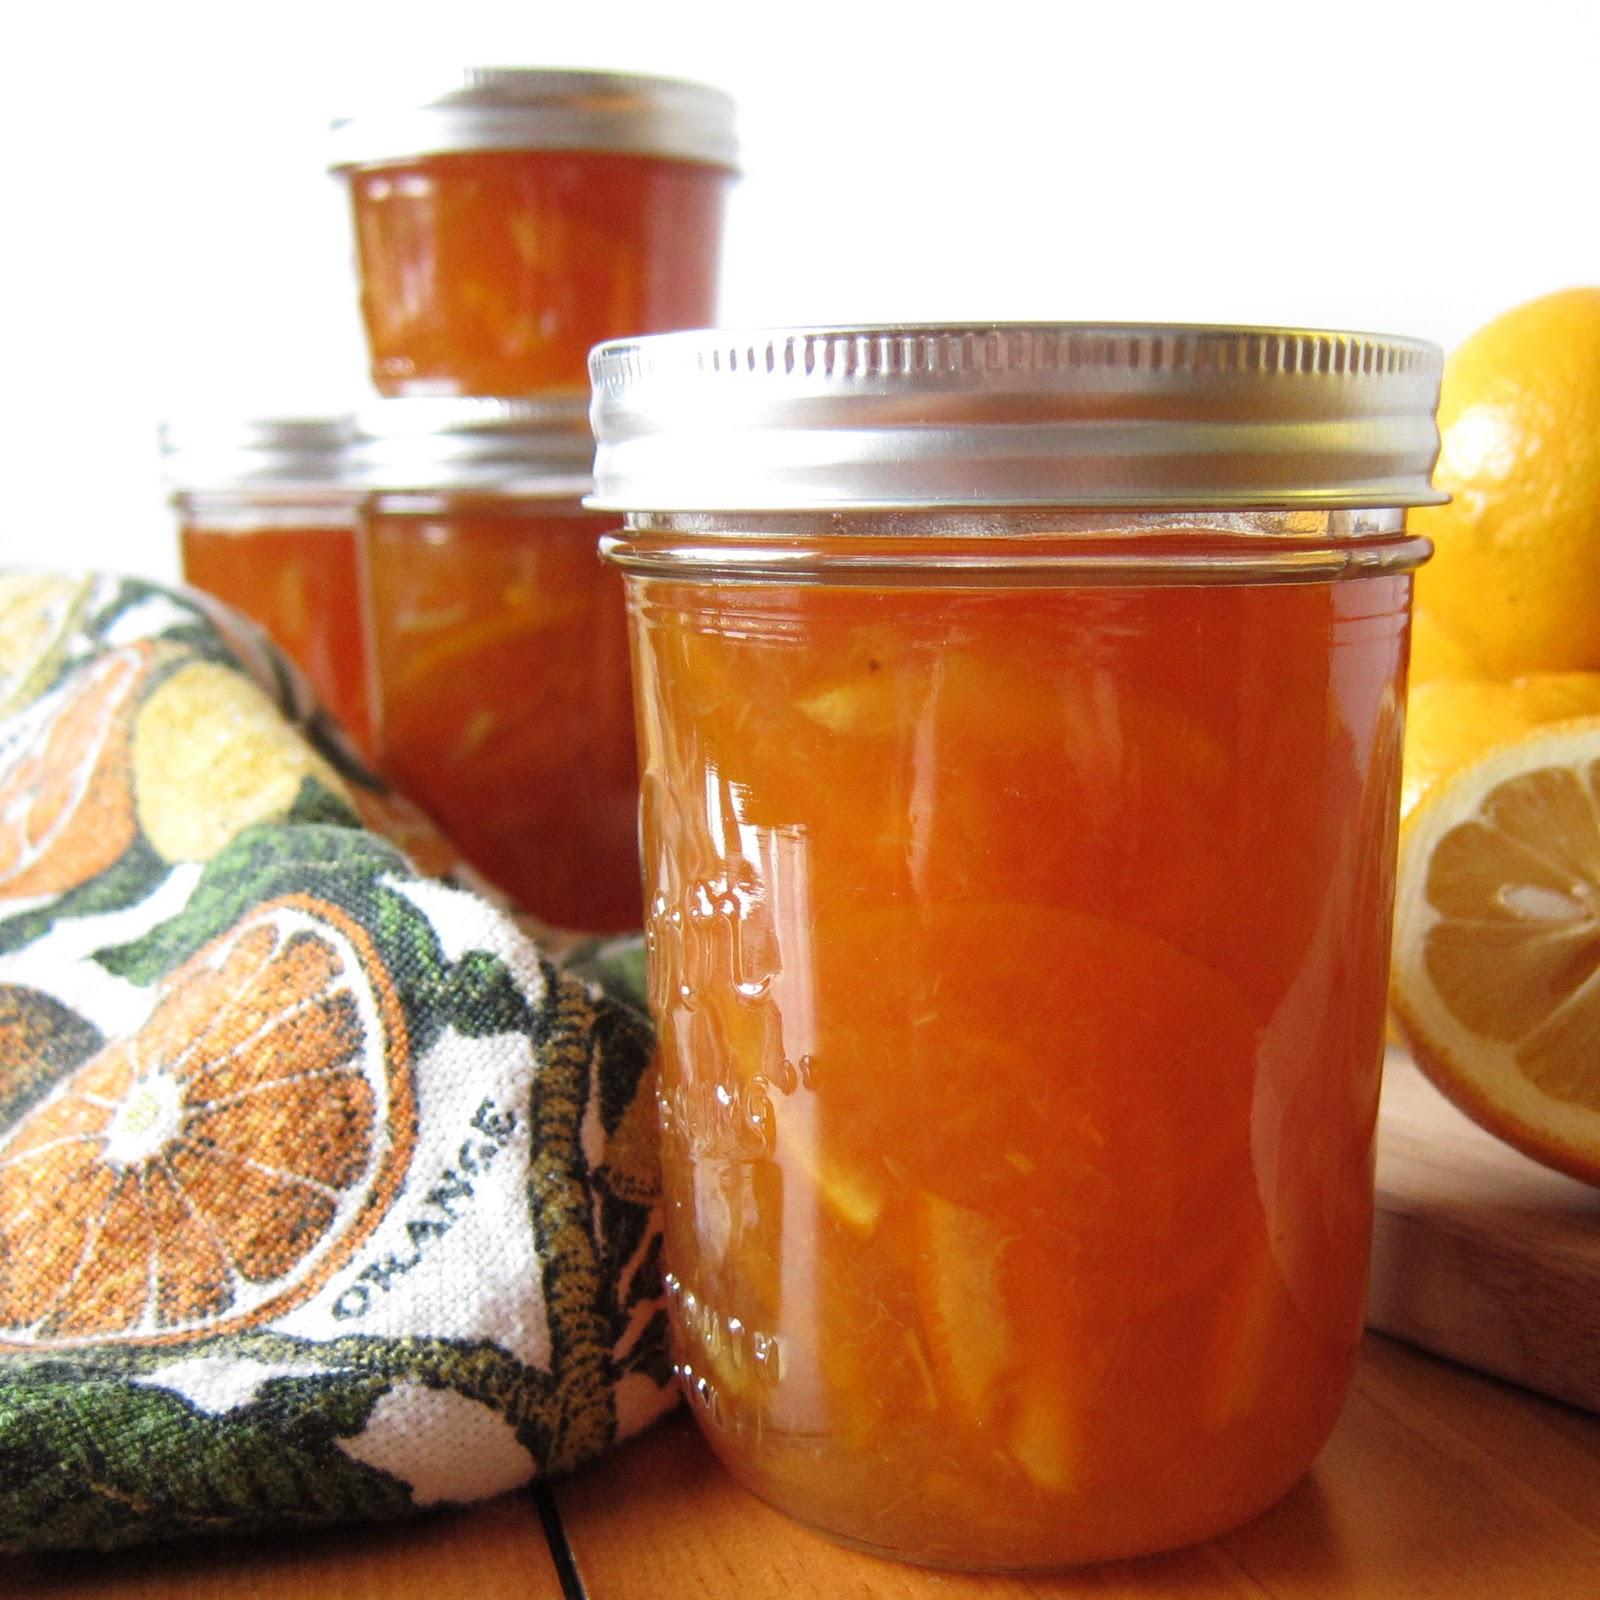 Arctic Garden Studio: Seville Orange Marmalade